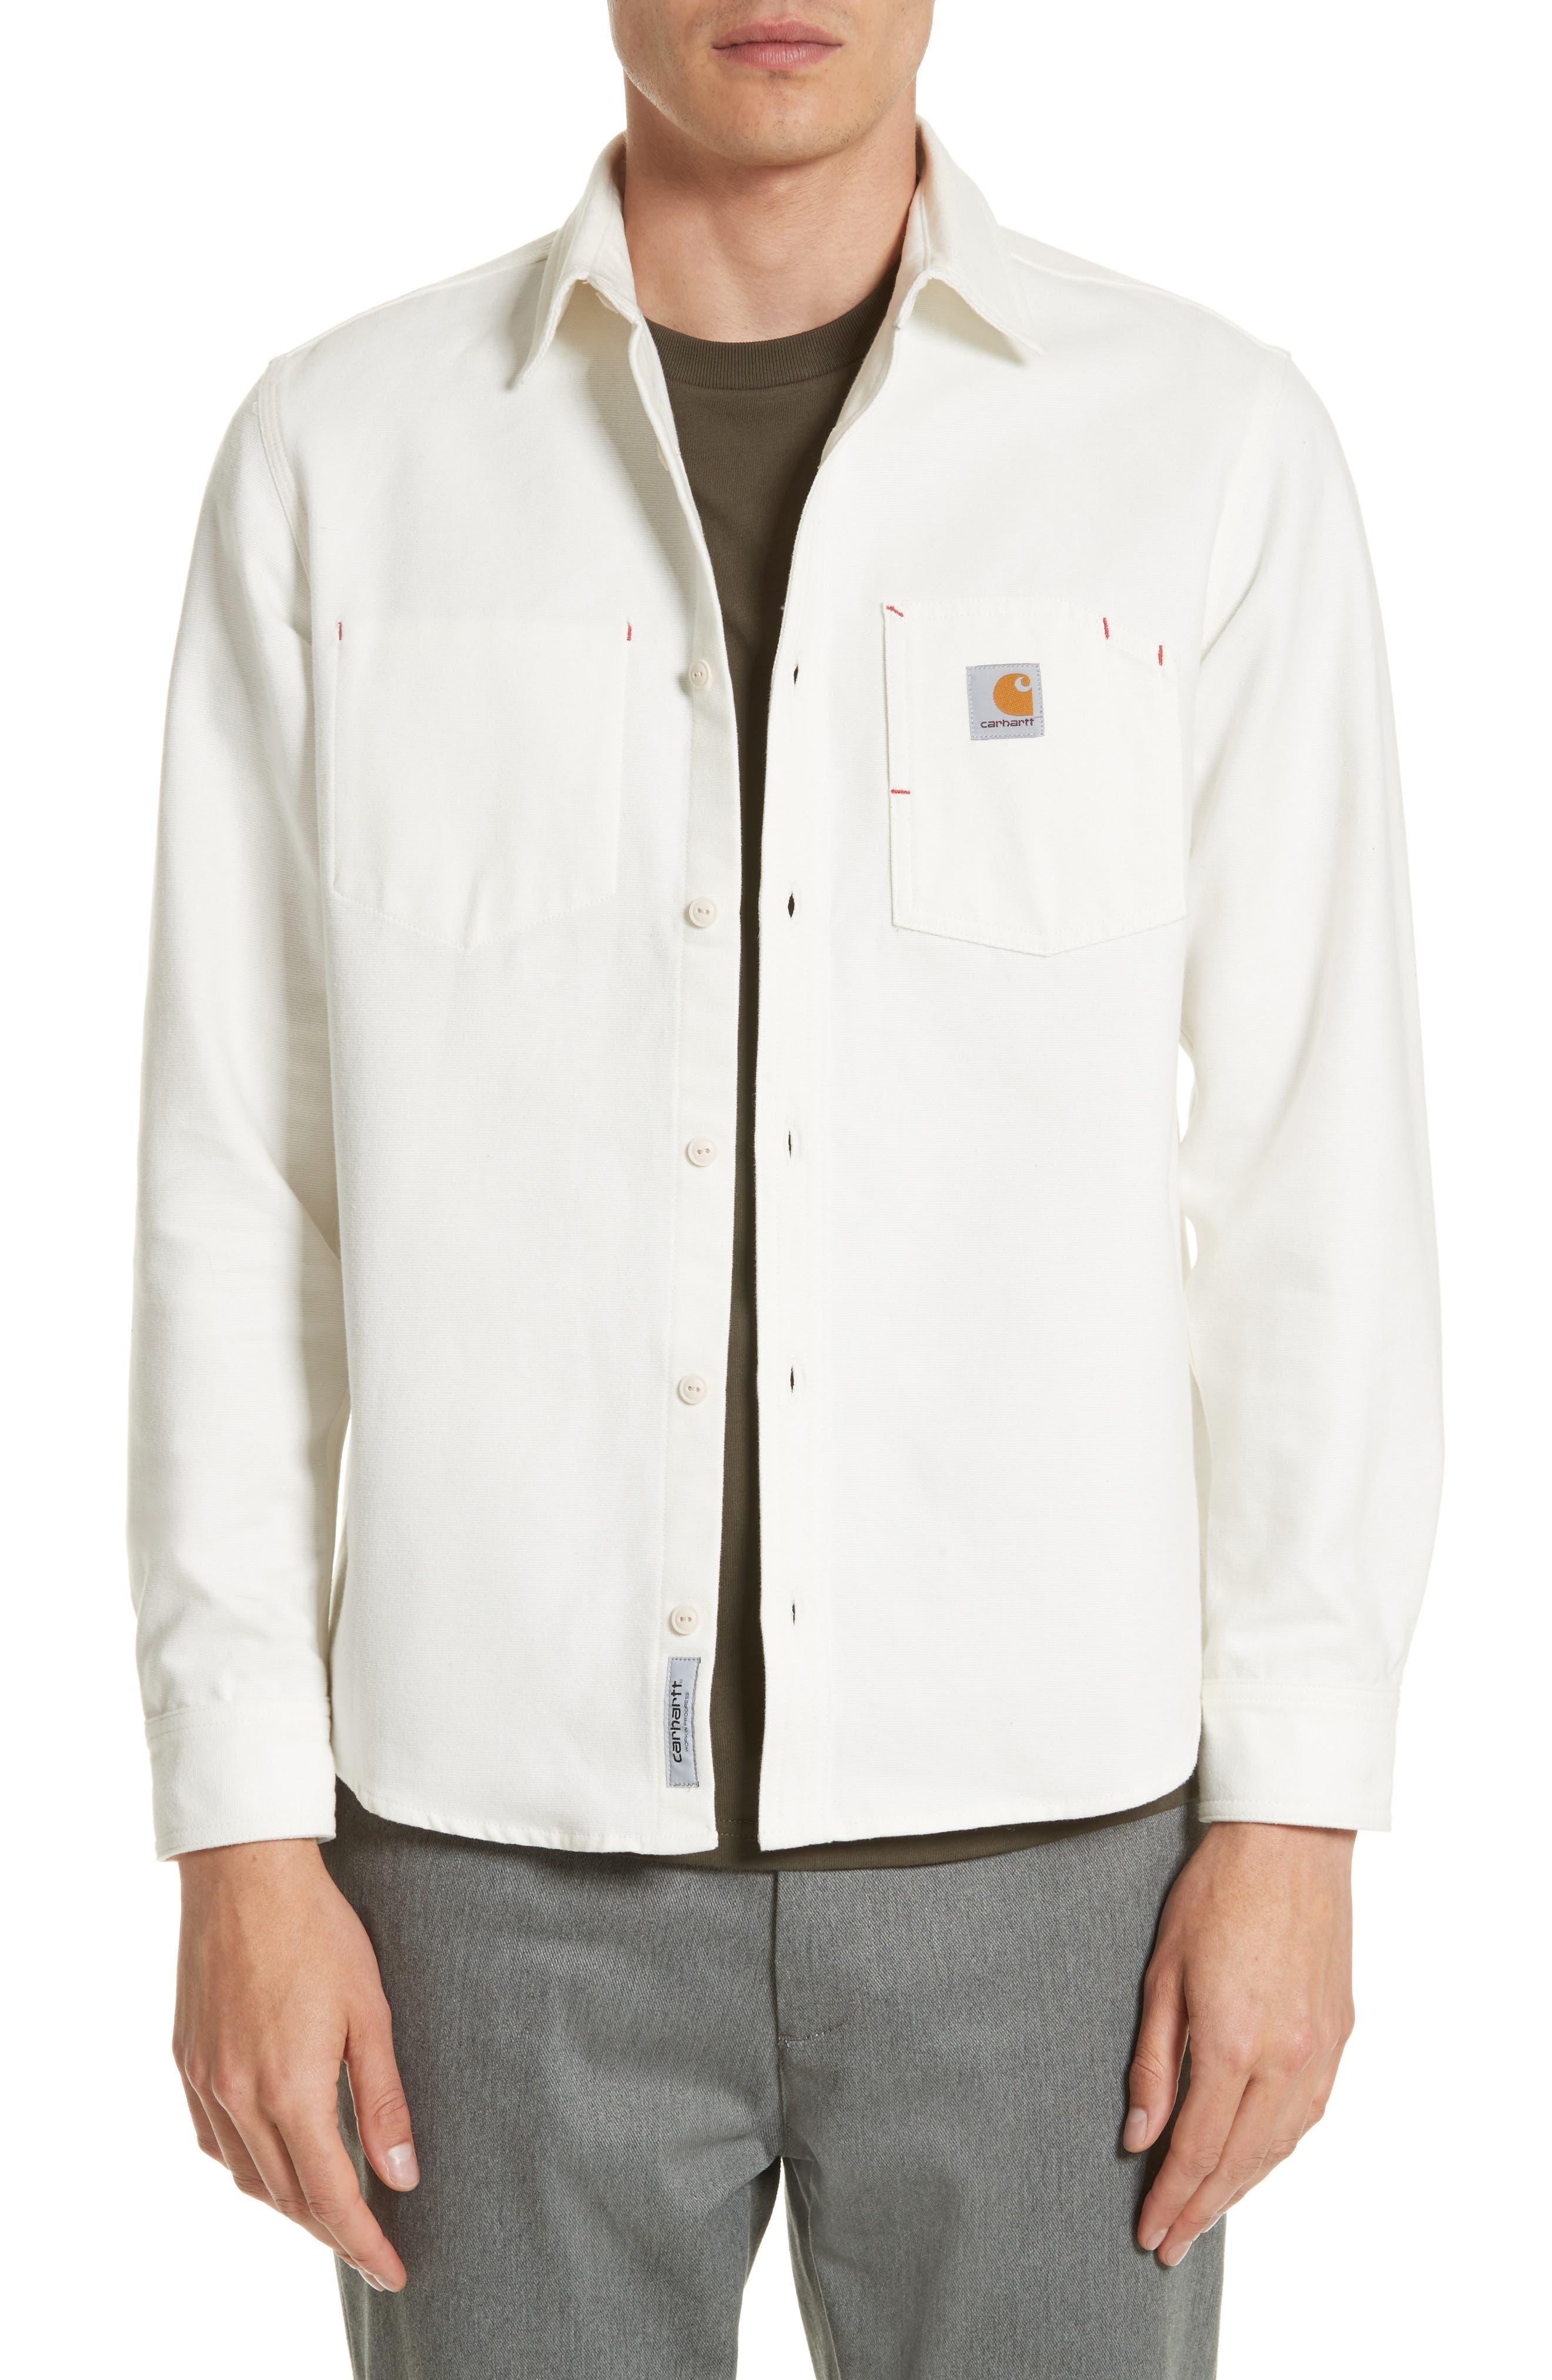 Carhartt Work in Progress Shirt Jacket